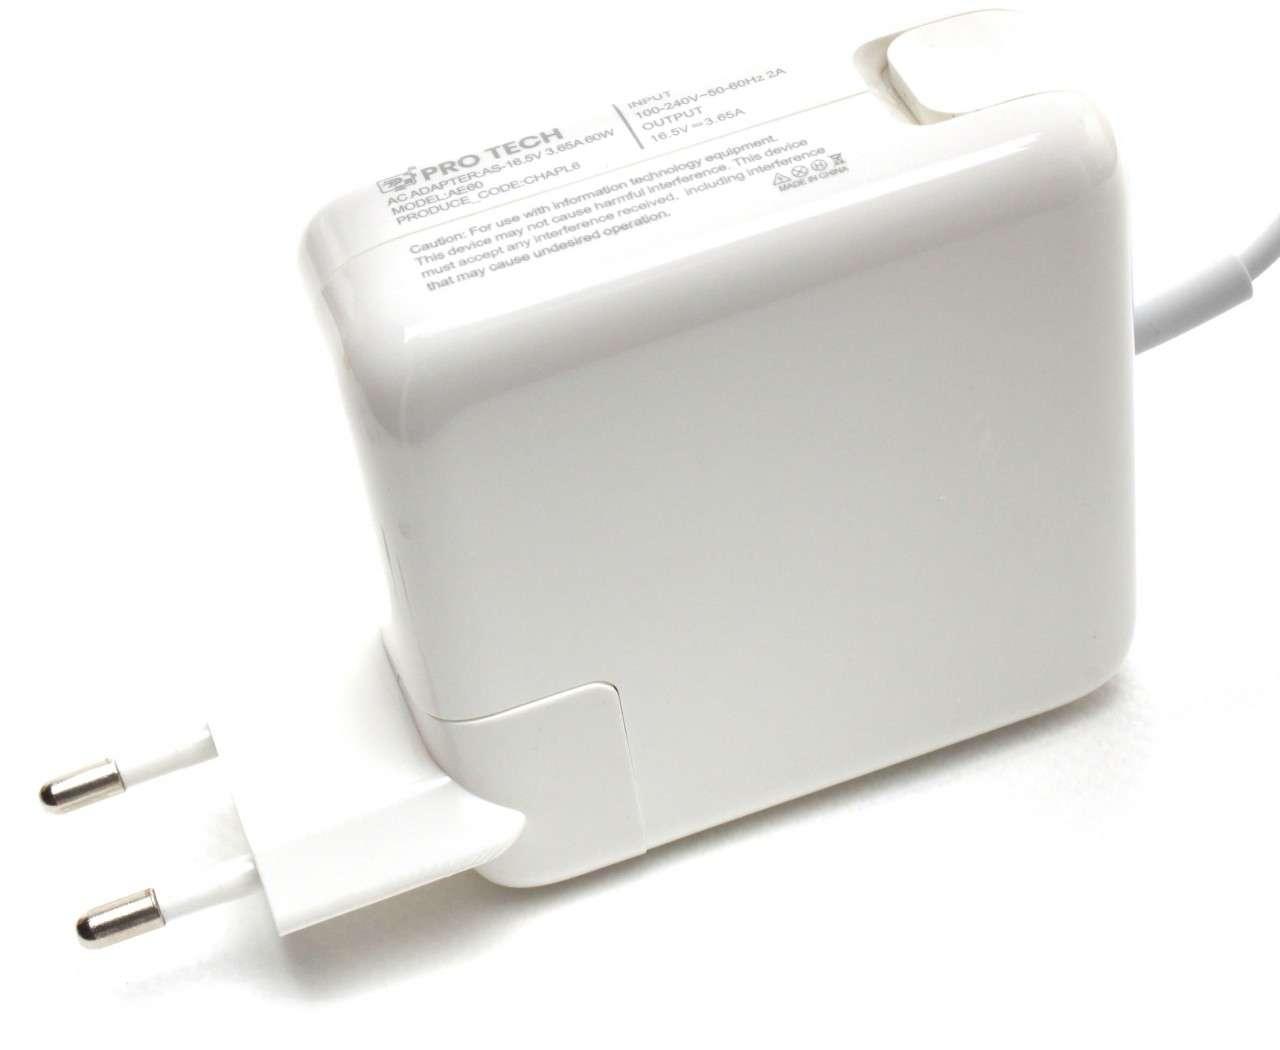 Incarcator Apple A1344 Replacement imagine